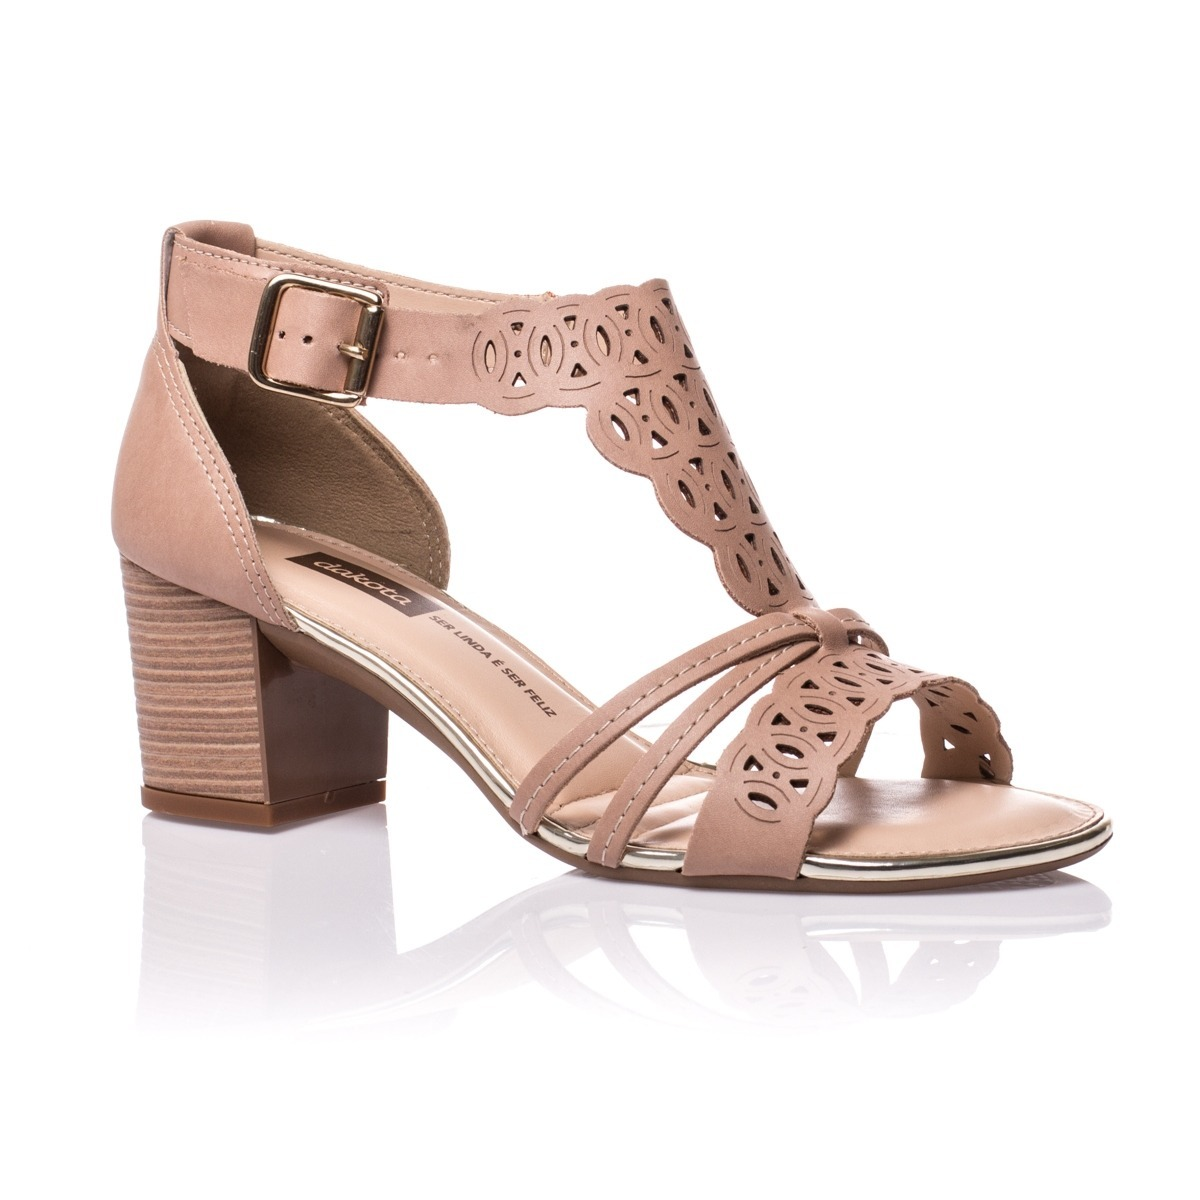 2536b97572 sandália dakota feminina taliba noz aveia passeio casual. Carregando zoom.